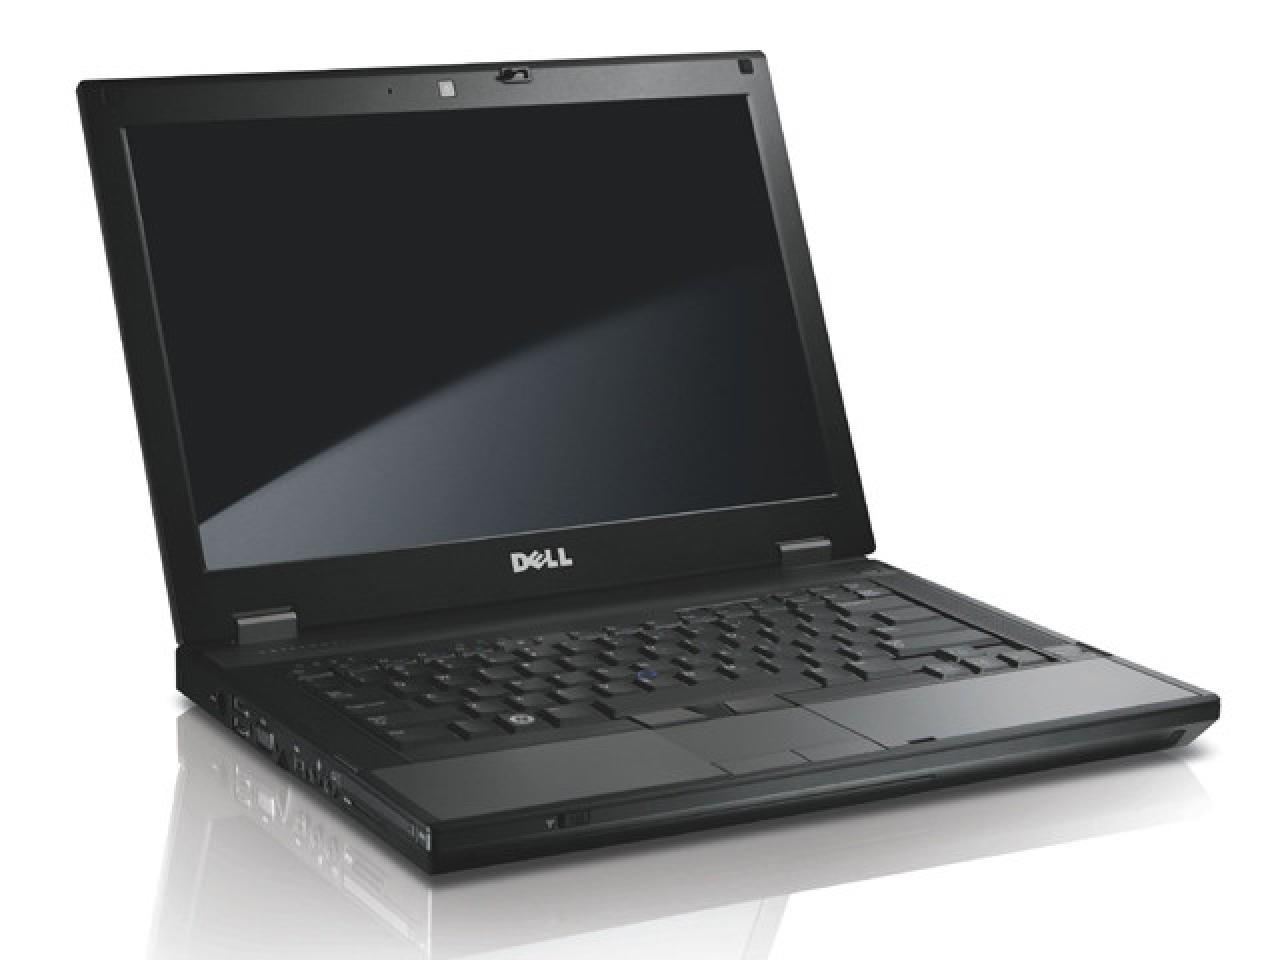 Dell Latitude E5500  - shop.bb-net.de